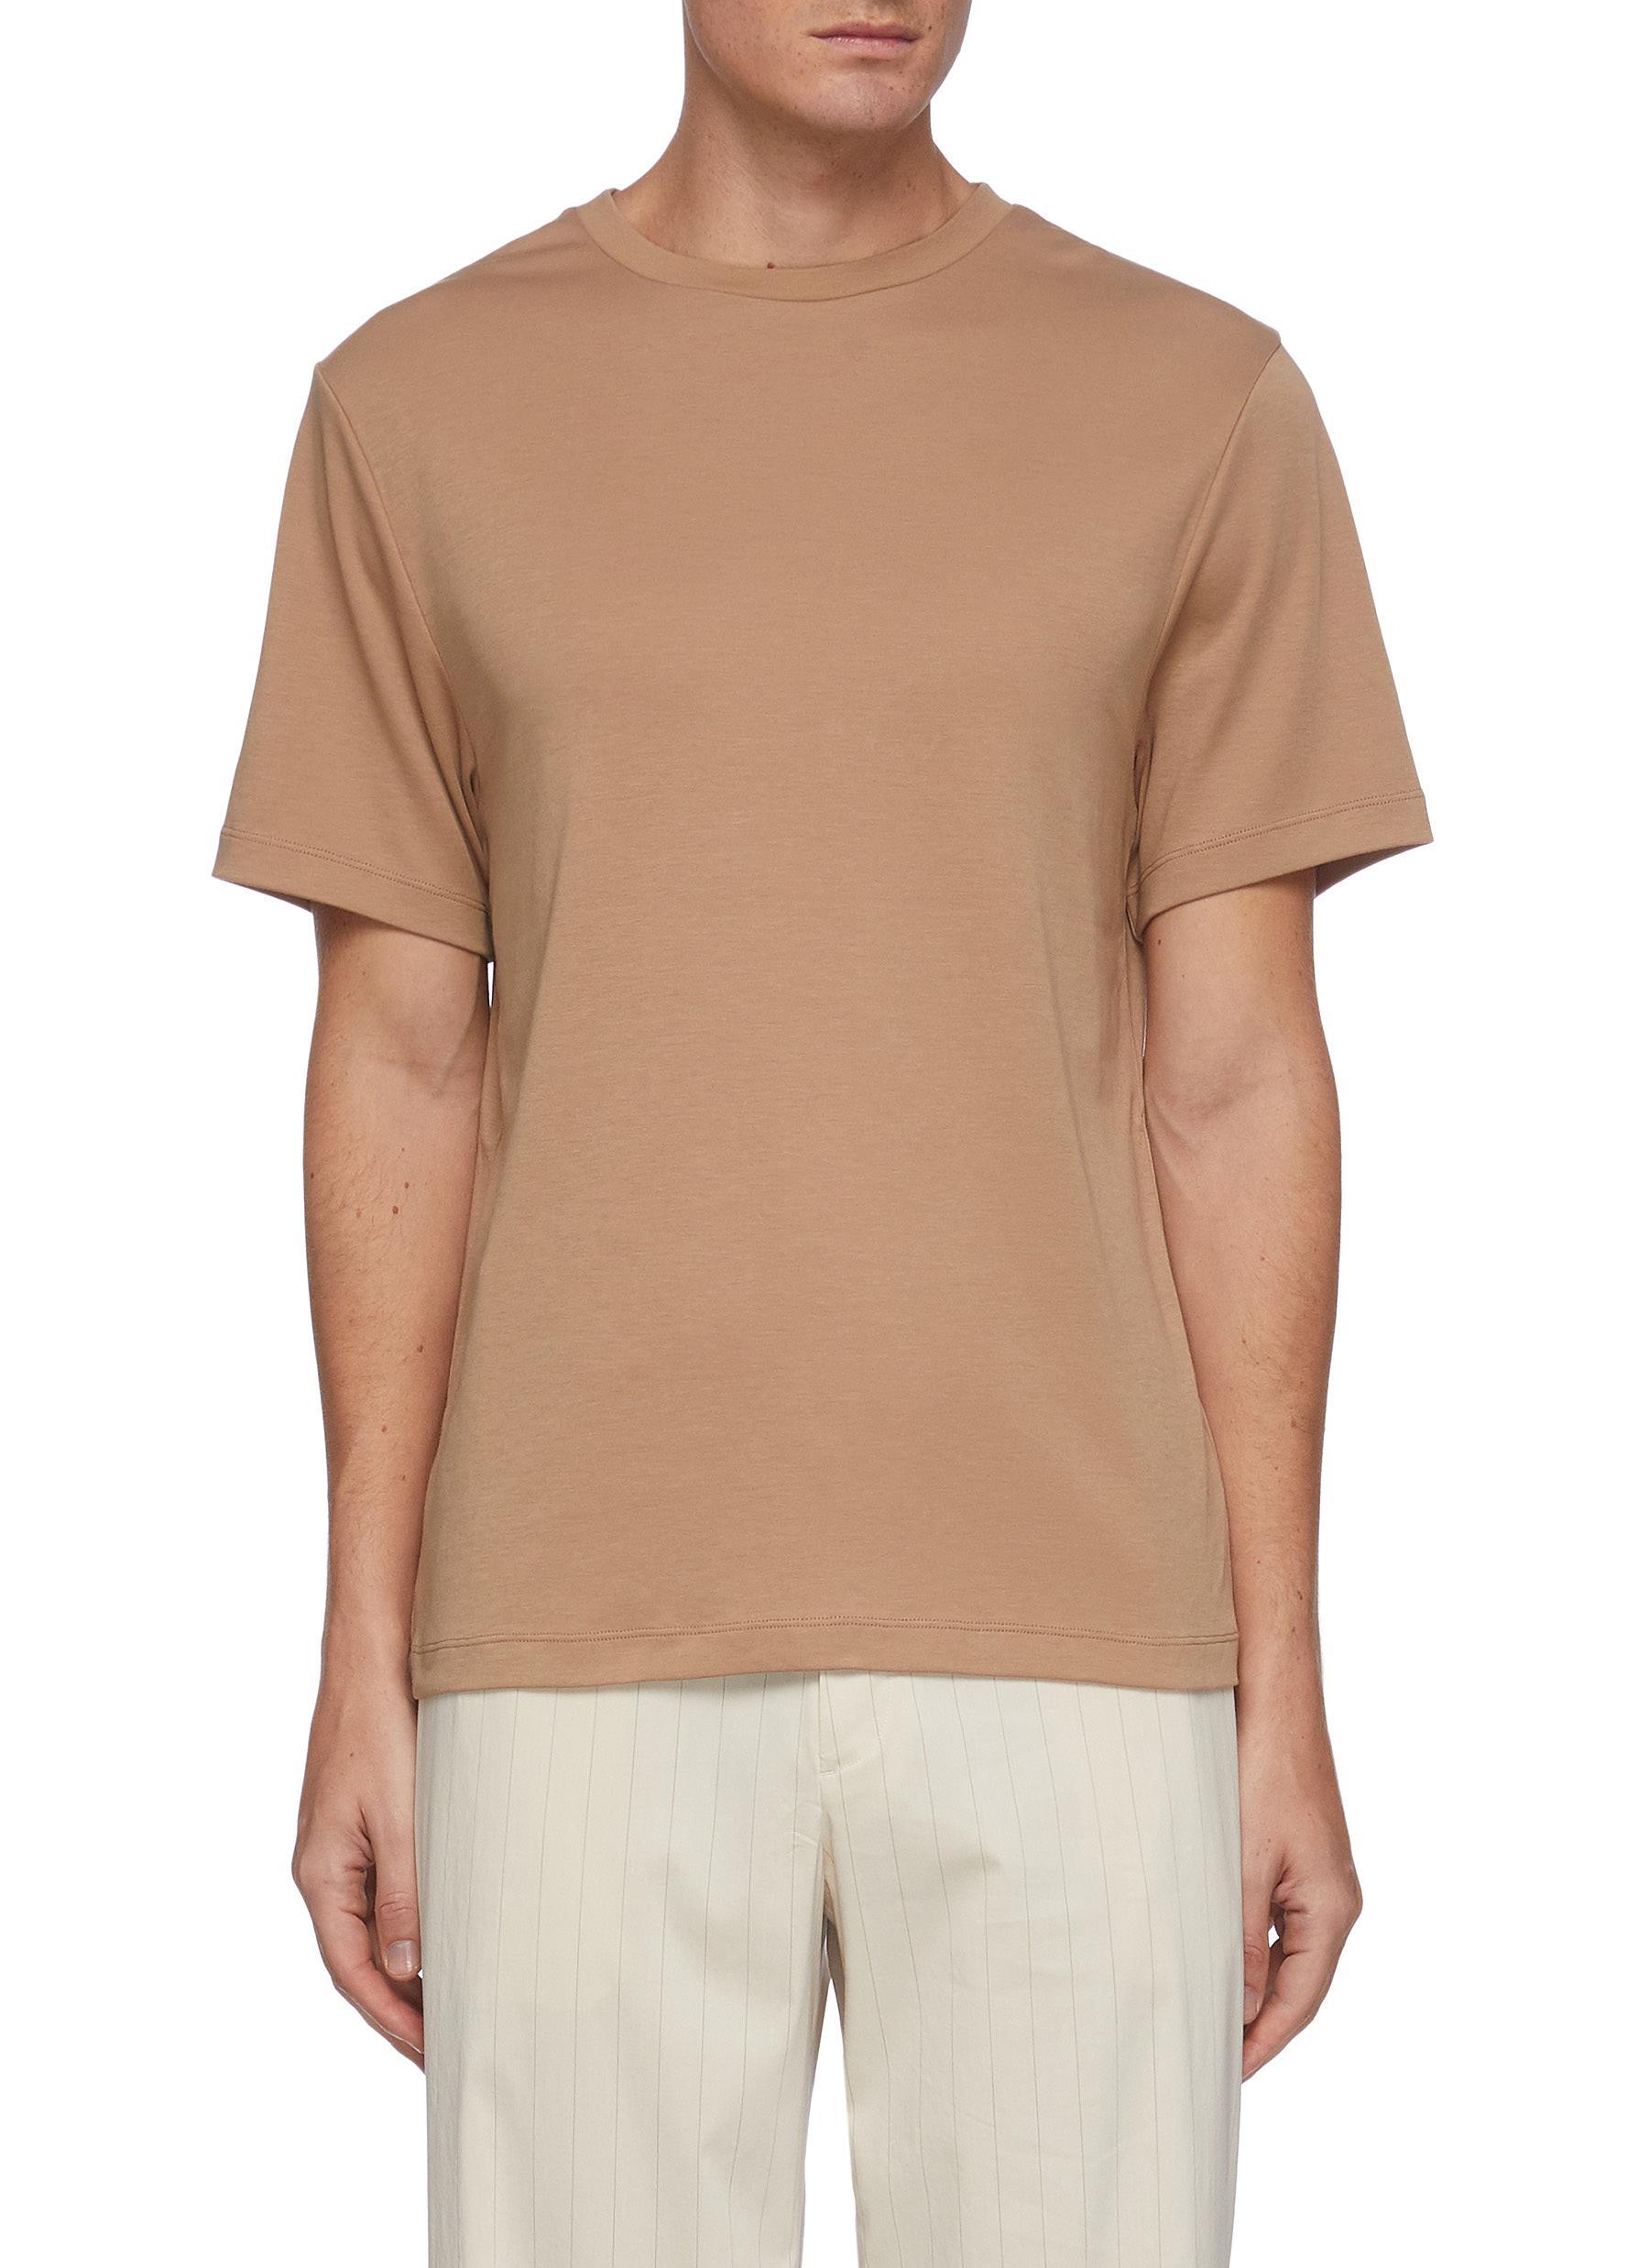 Slim cotton T-shirt